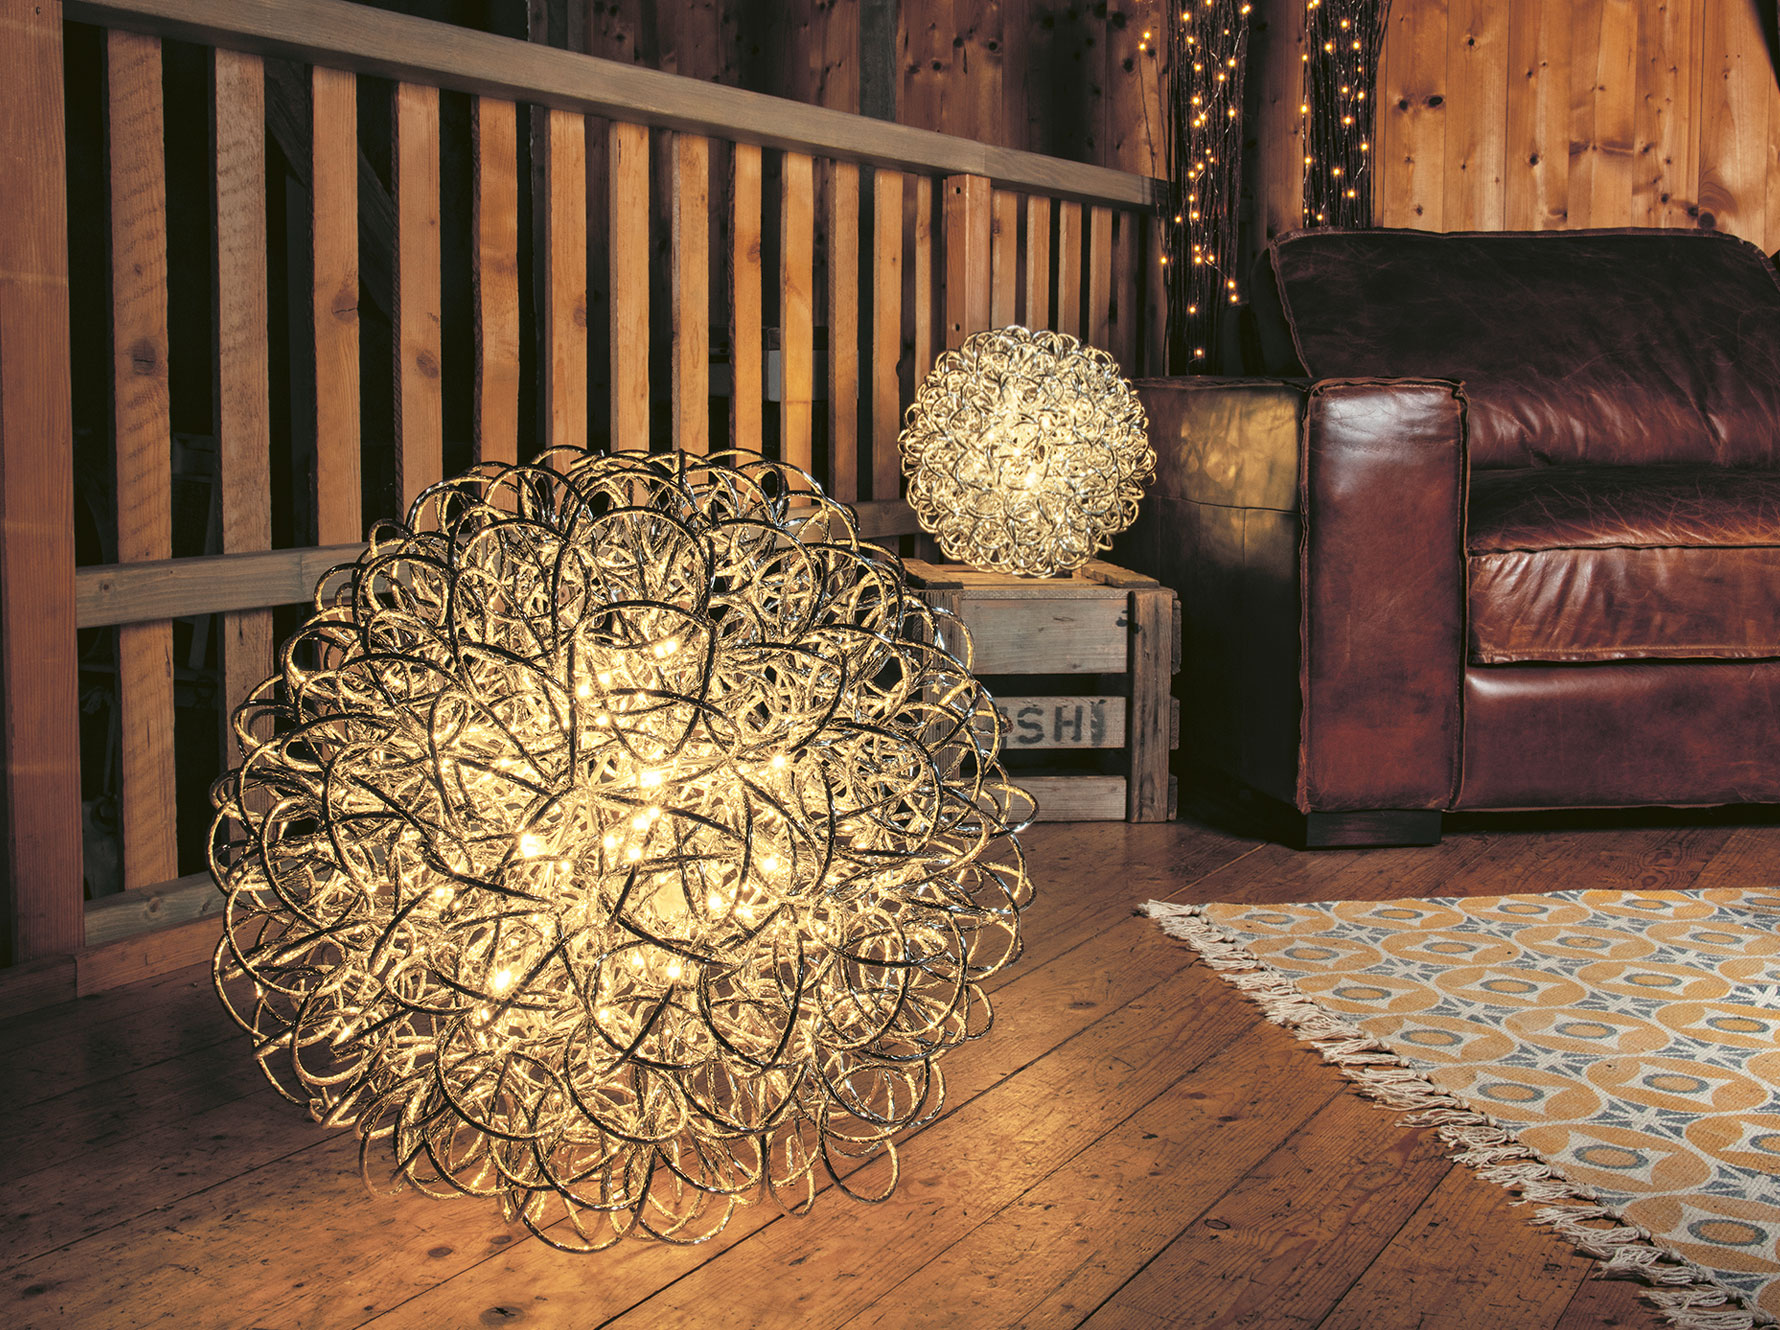 Neuheiten Weihnachtsbeleuchtung.Weihnachtsbeleuchtung Elektro Material Ag